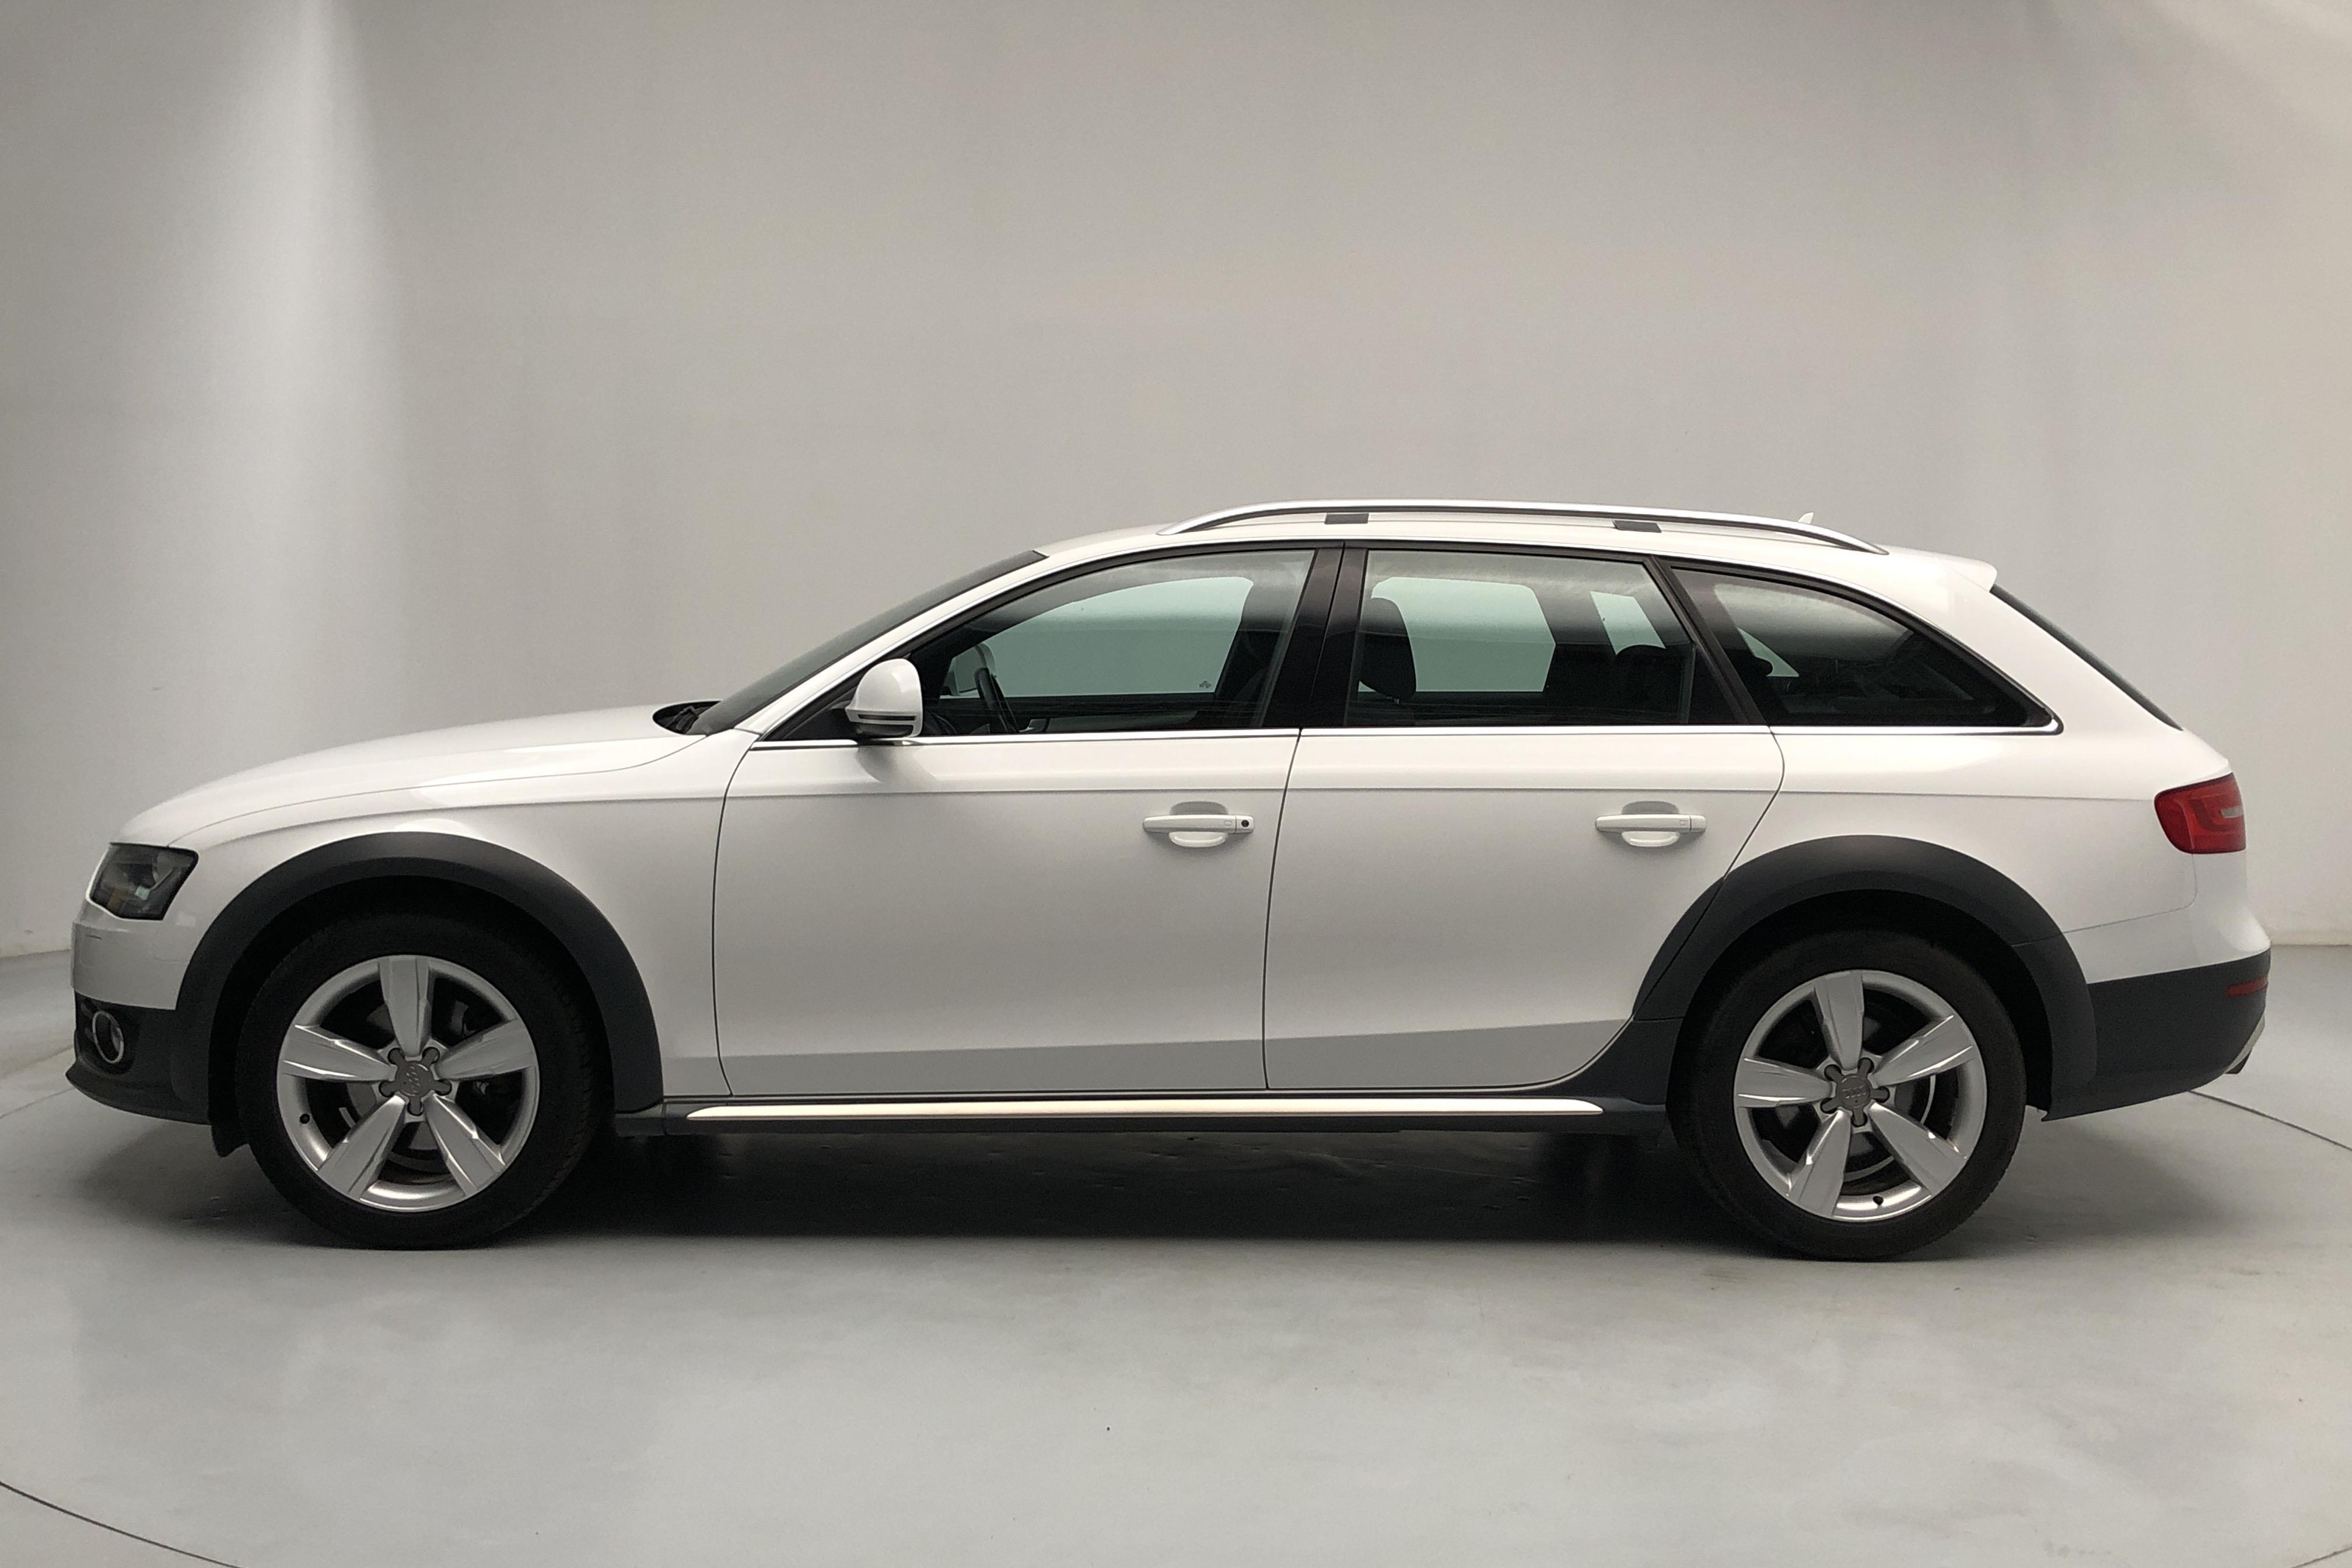 Audi A4 Allroad 2.0 TDI clean diesel Avant quattro (190hk) - 143 000 km - Automatic - white - 2015